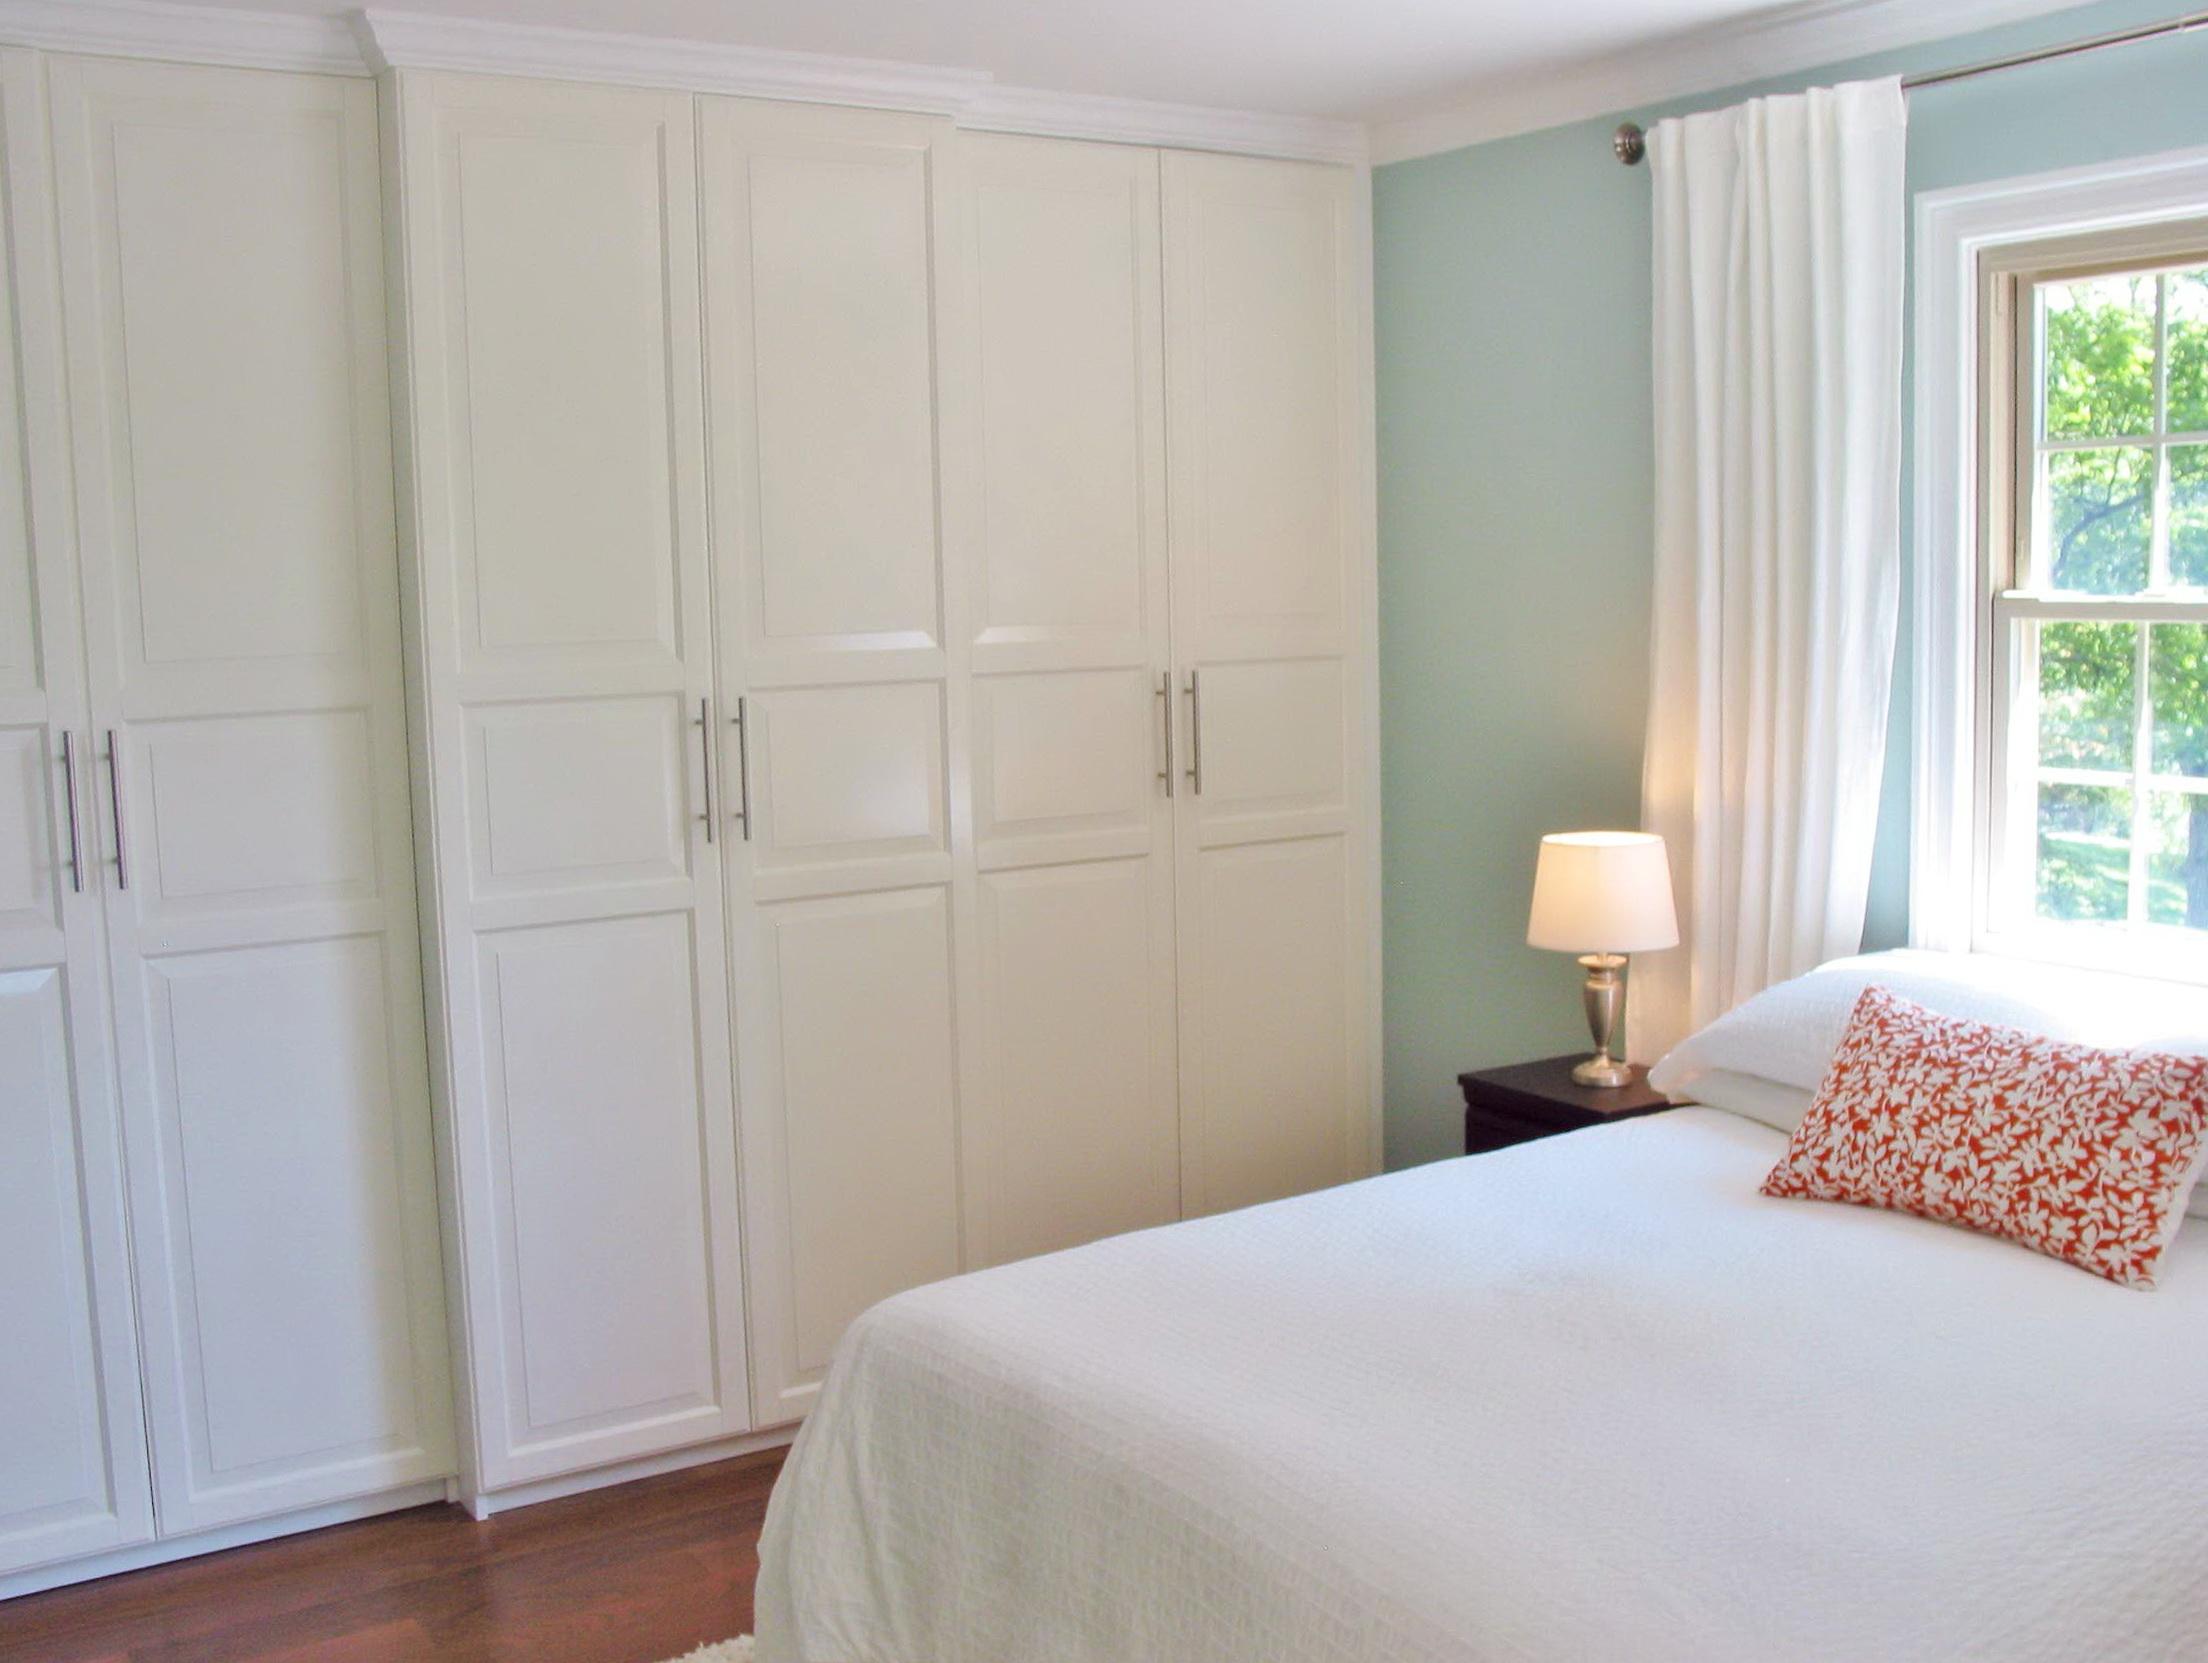 Small Closet Door Options